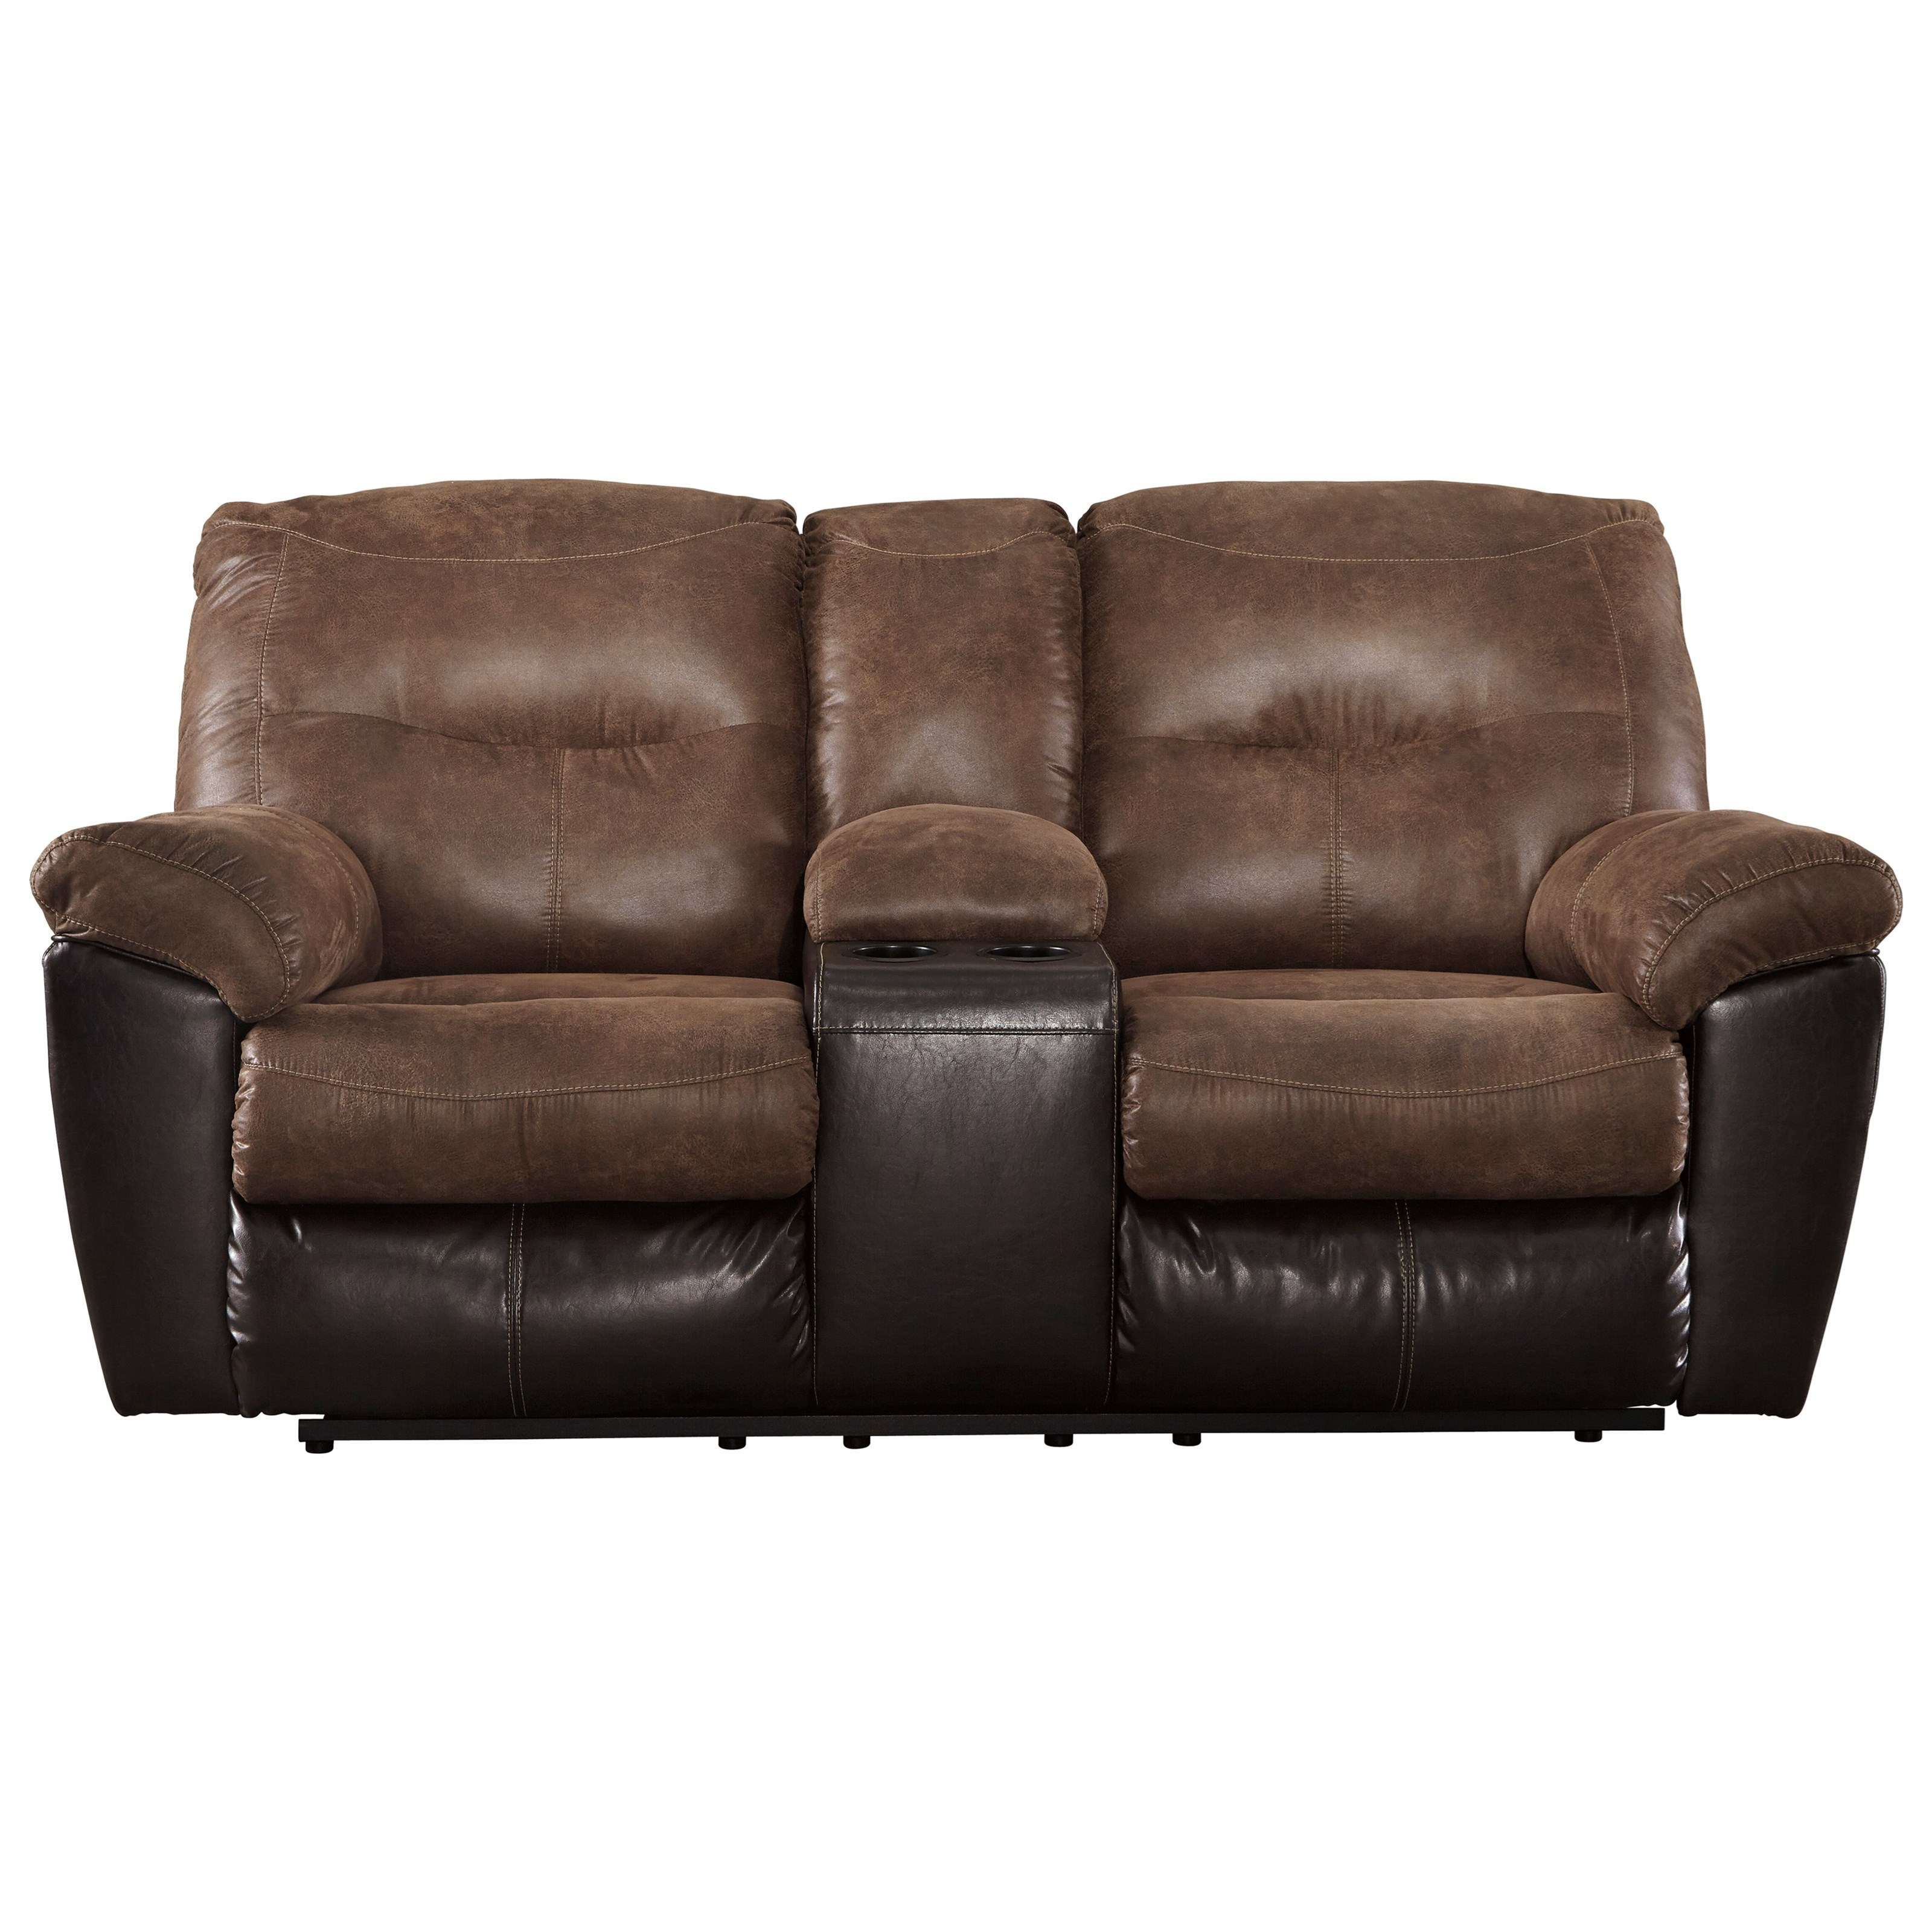 ashley sofa recliners clic clac bed signature design follett 6520294 two tone faux